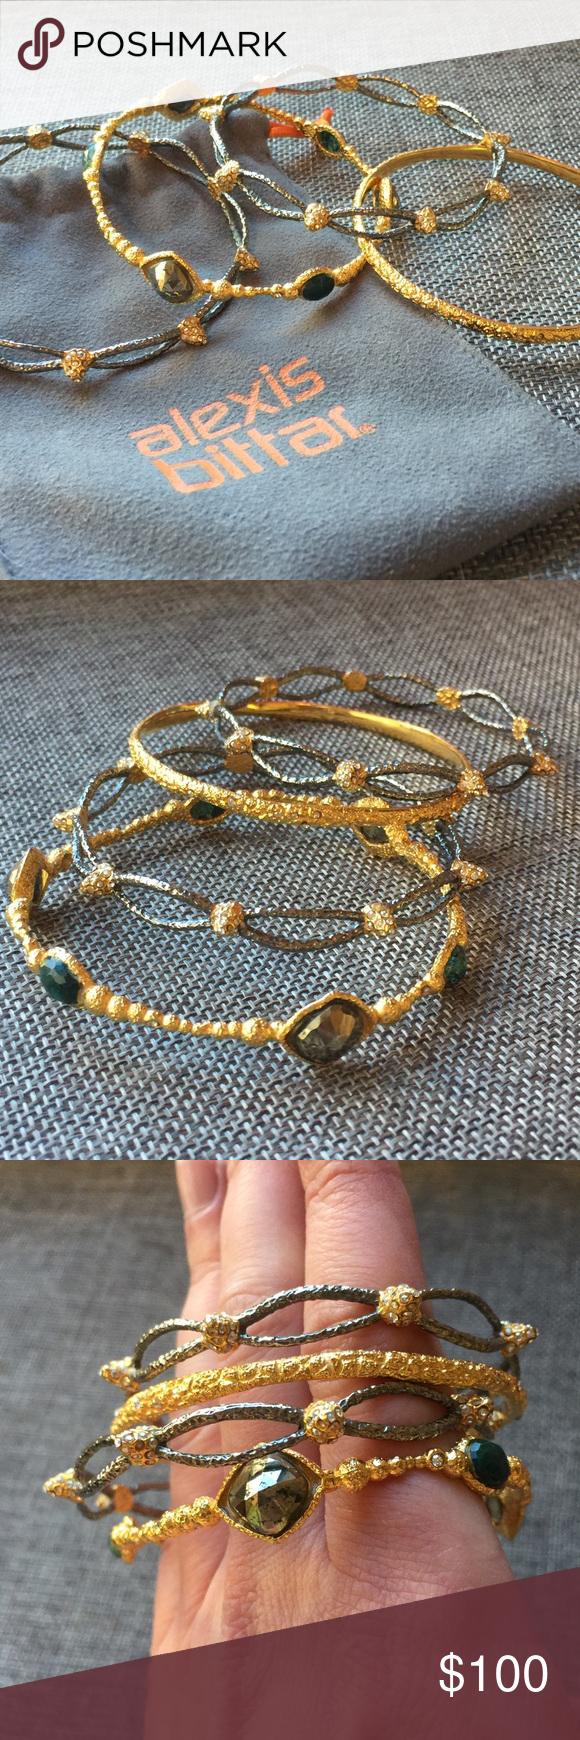 Alexis Bittar Gold/Silver Gem Bangle Bracelets Alexis Bittar Gold/Silver Gem Bangle Bracelets. Set of 4. Alexis Bittar Jewelry Bracelets